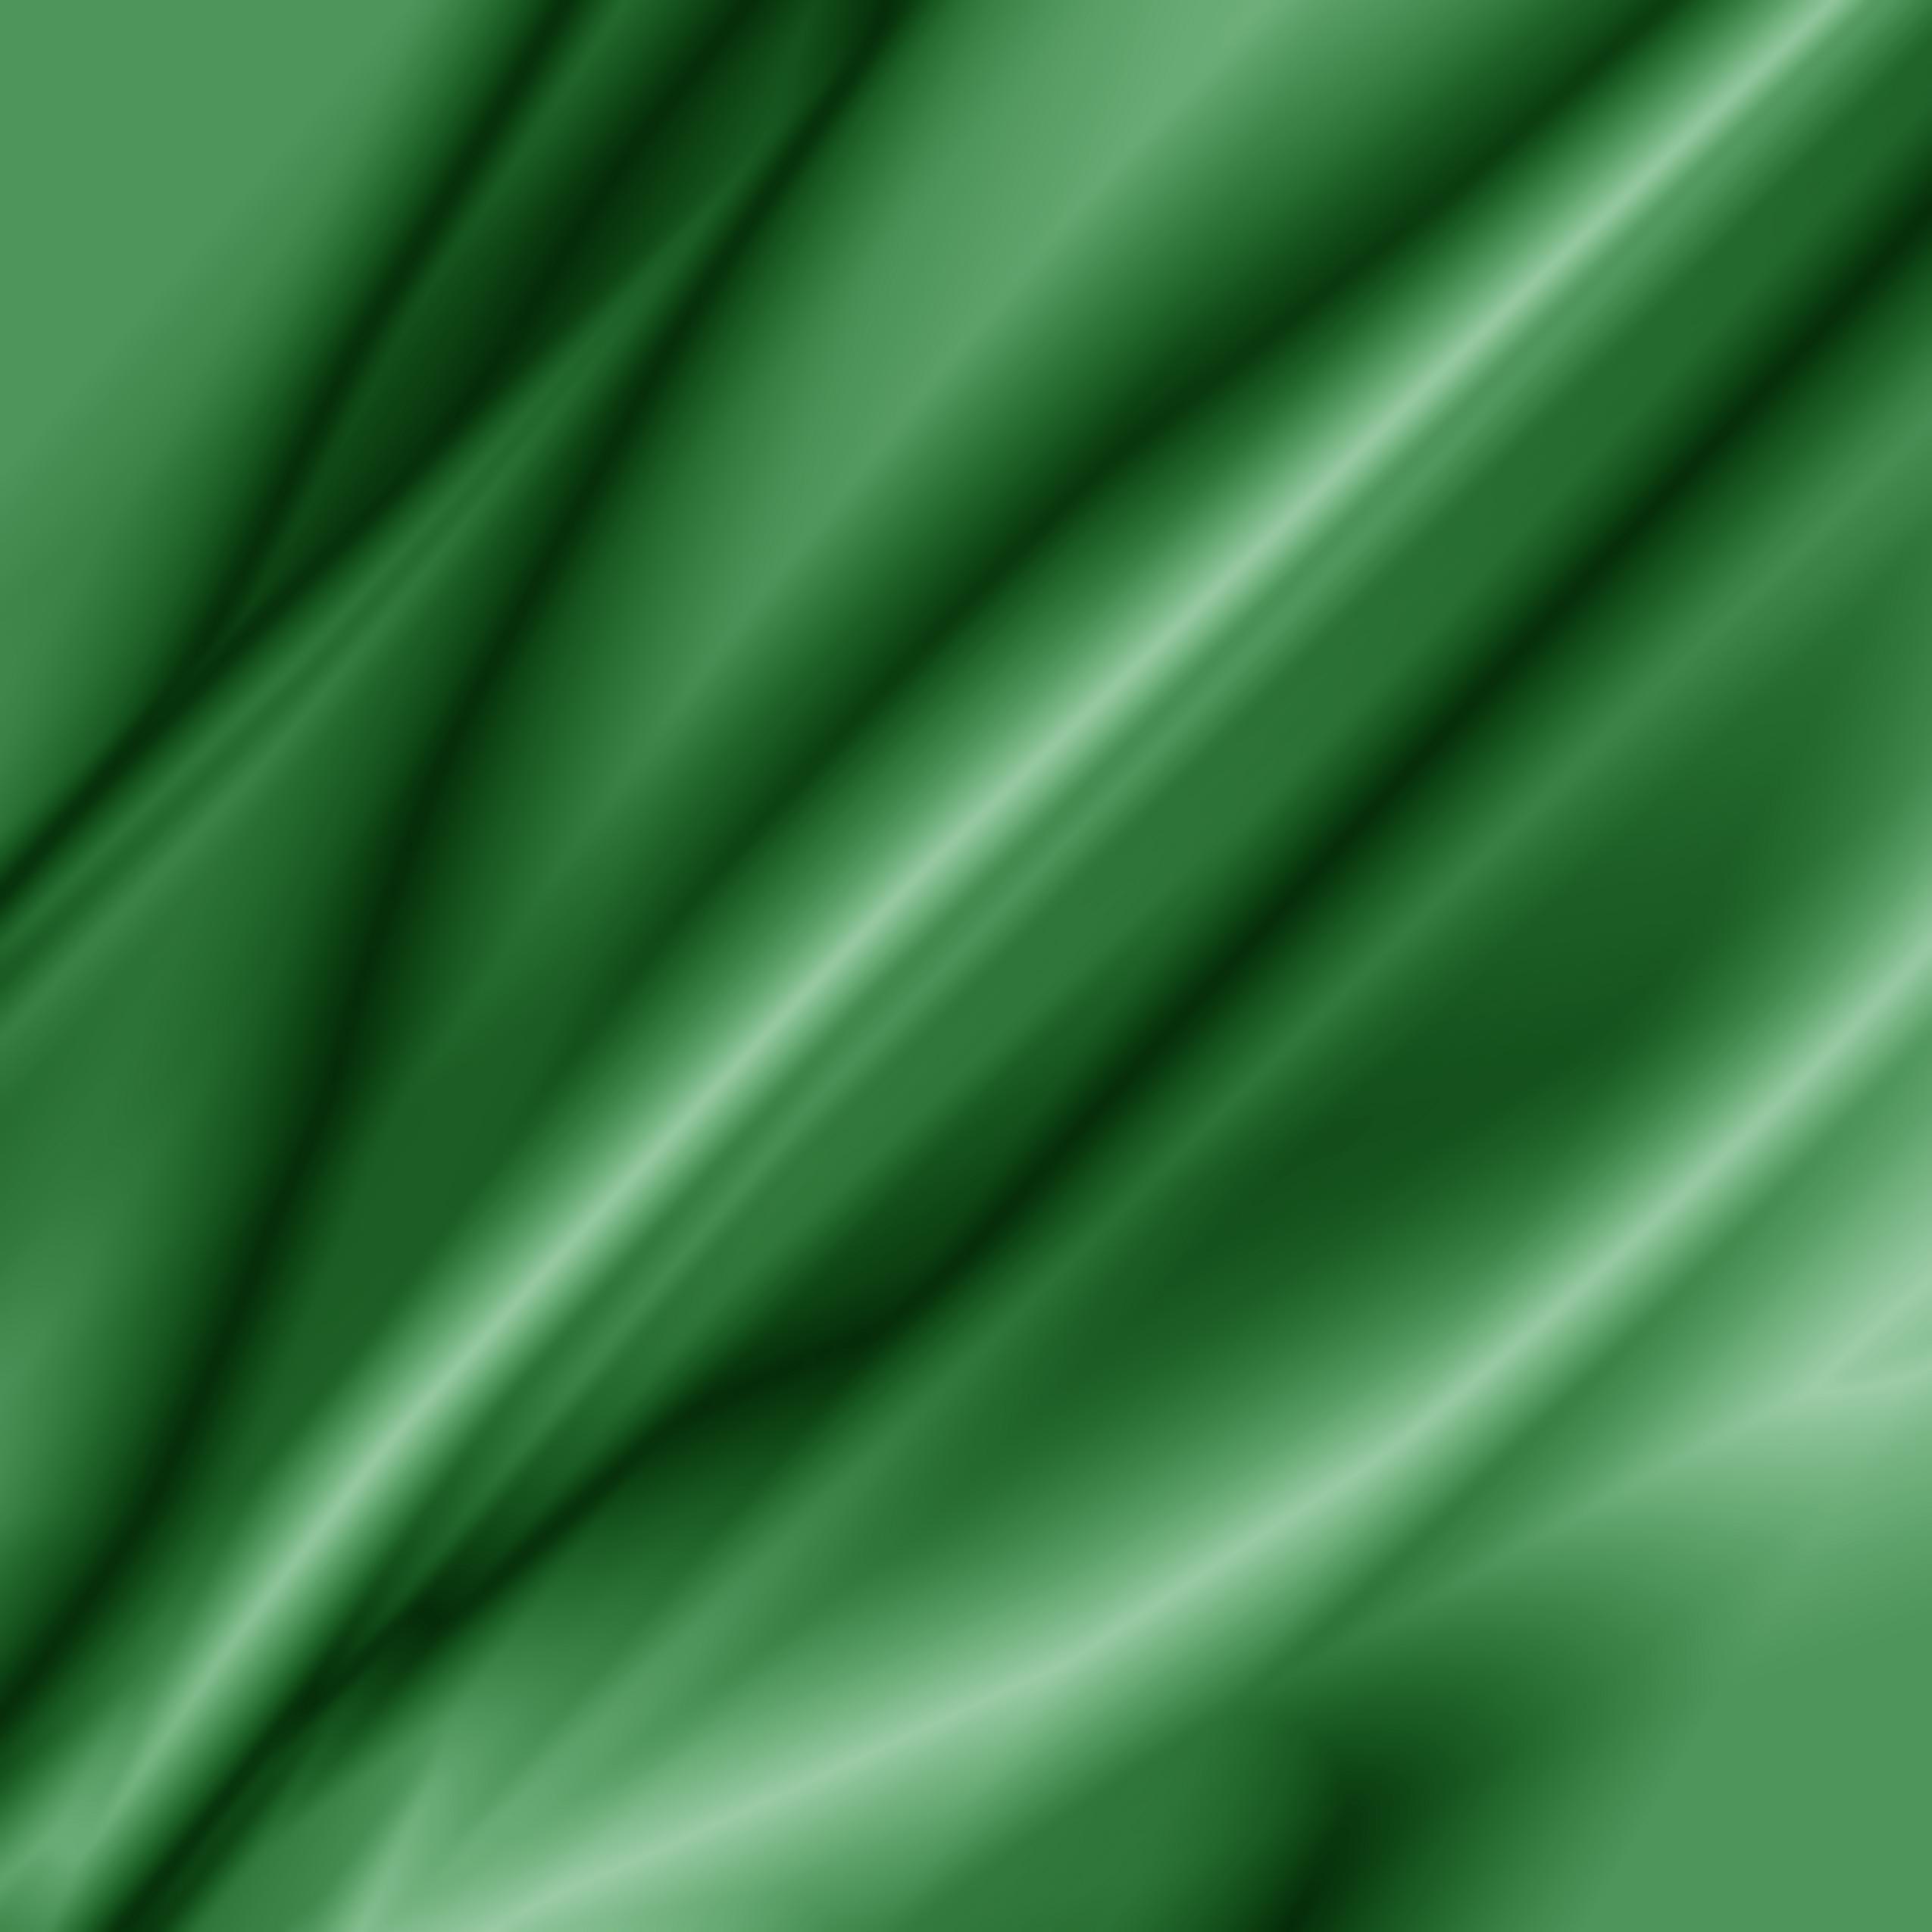 Free photo Green fabric texture shiny sheet silk Non